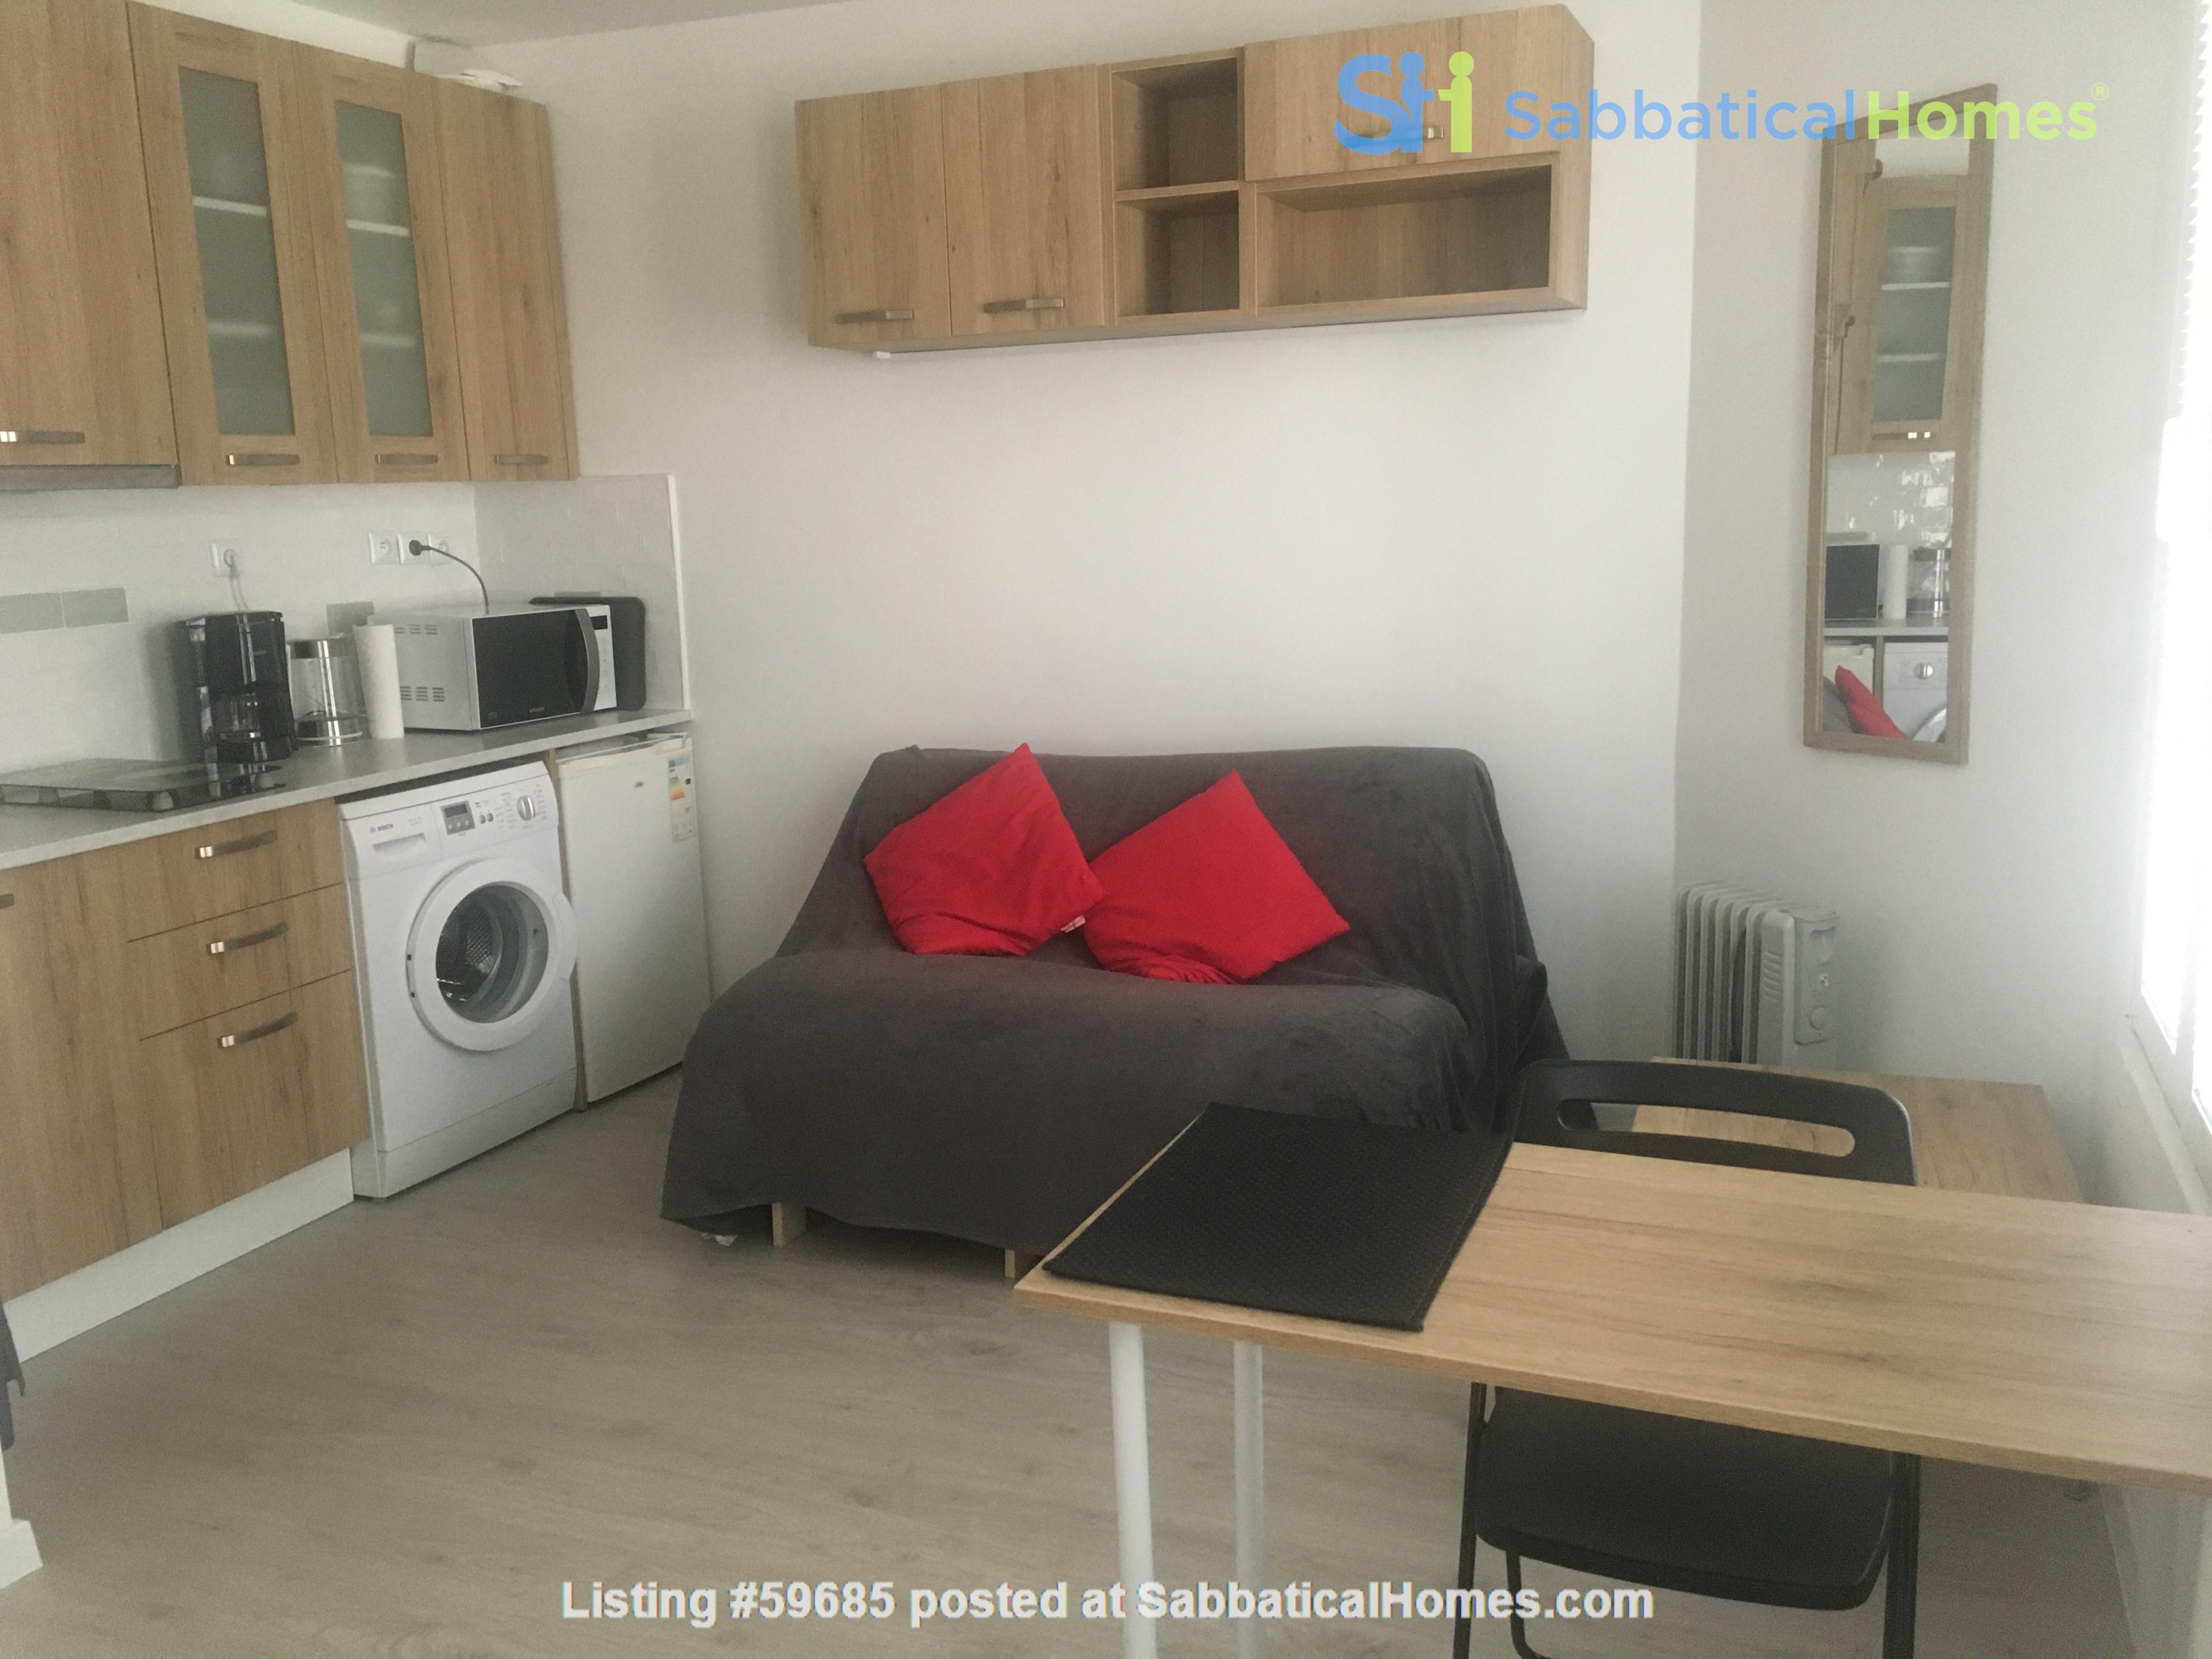 Studio: appartement in trendy Rue Oberkampf quarter Home Rental in Paris, Île-de-France, France 1